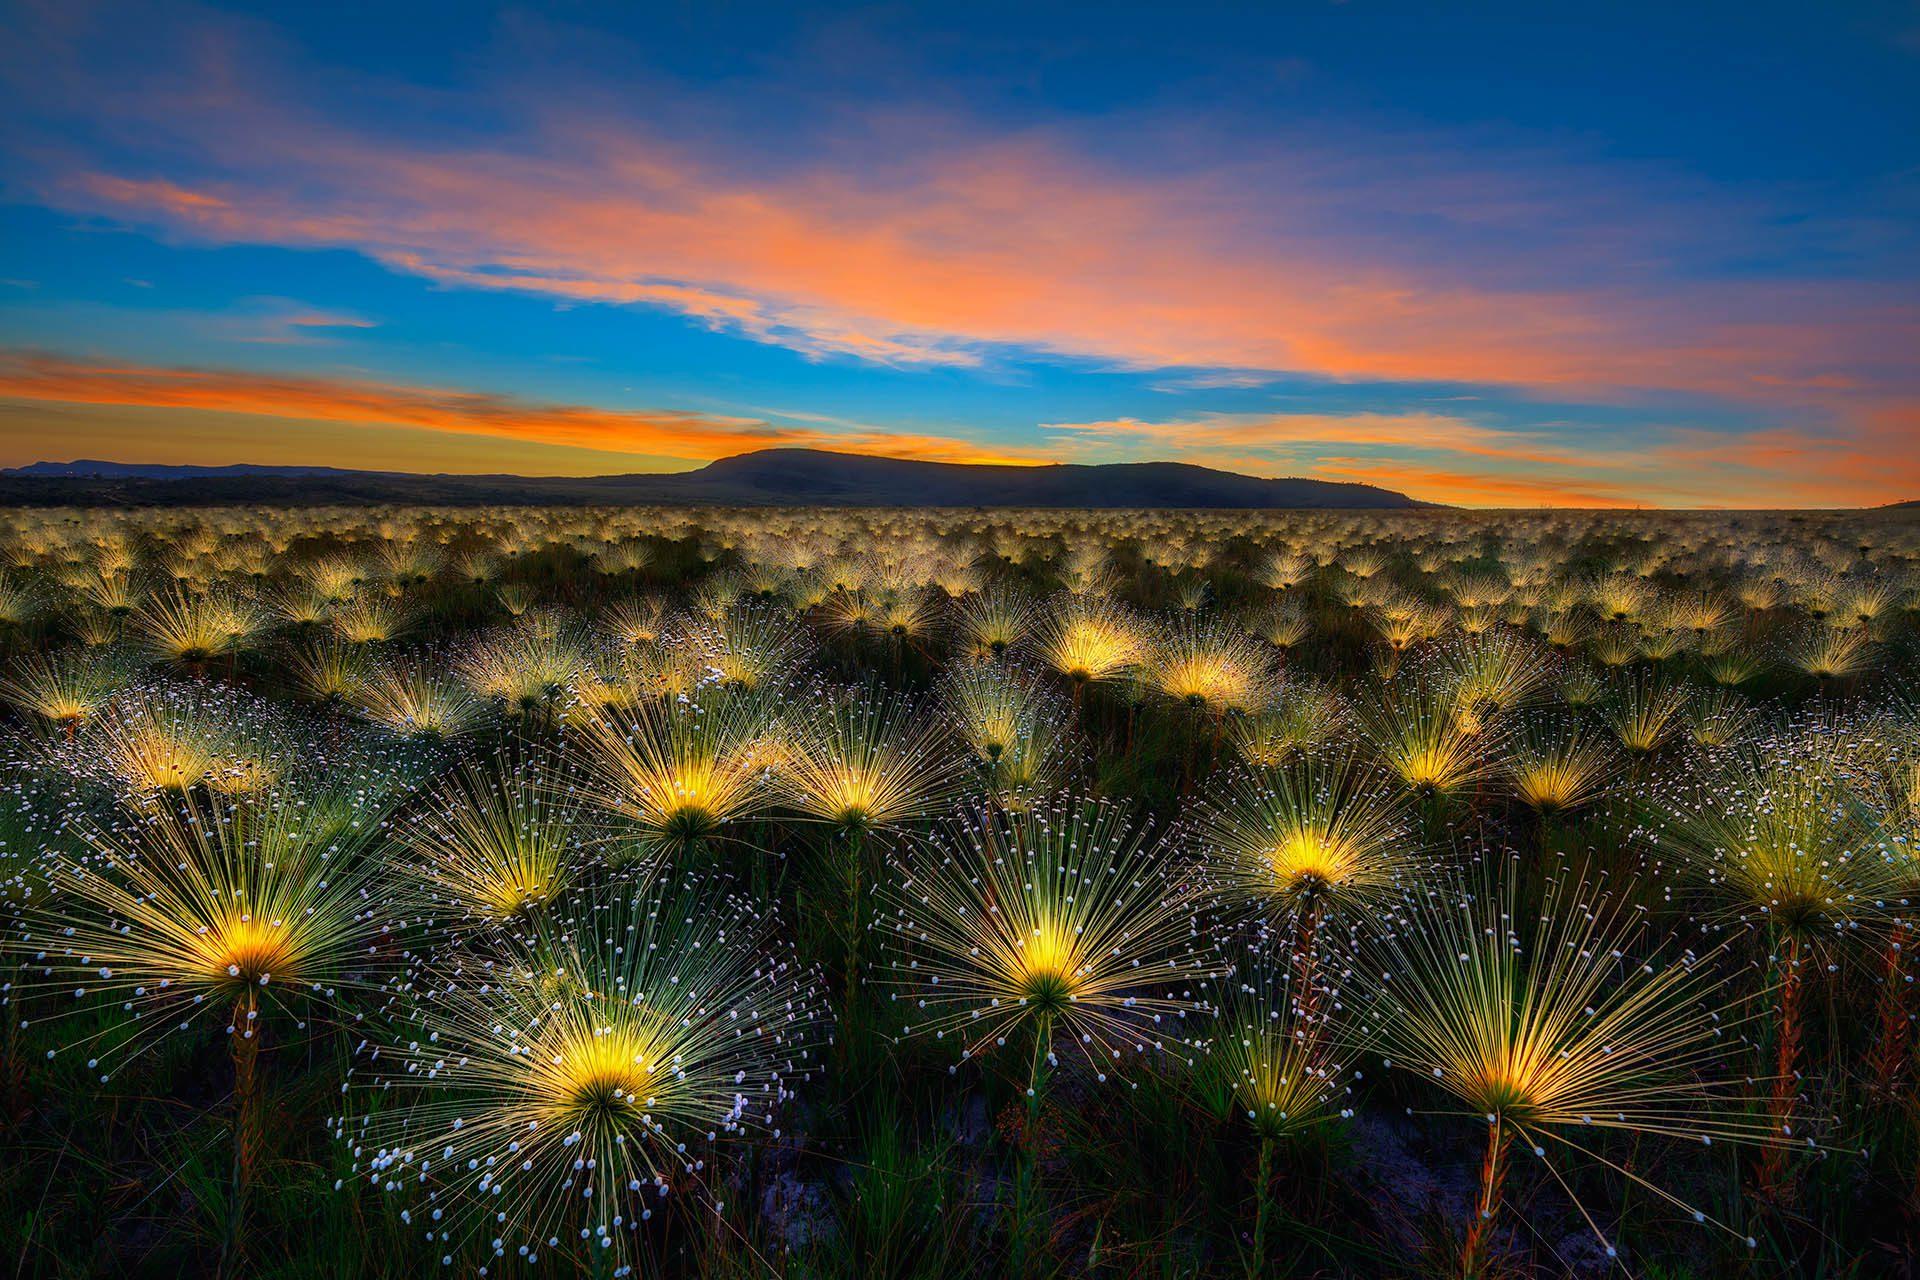 Cerrado Sunrise, the Winner of the International Garden Photographer of the Year Competition 11